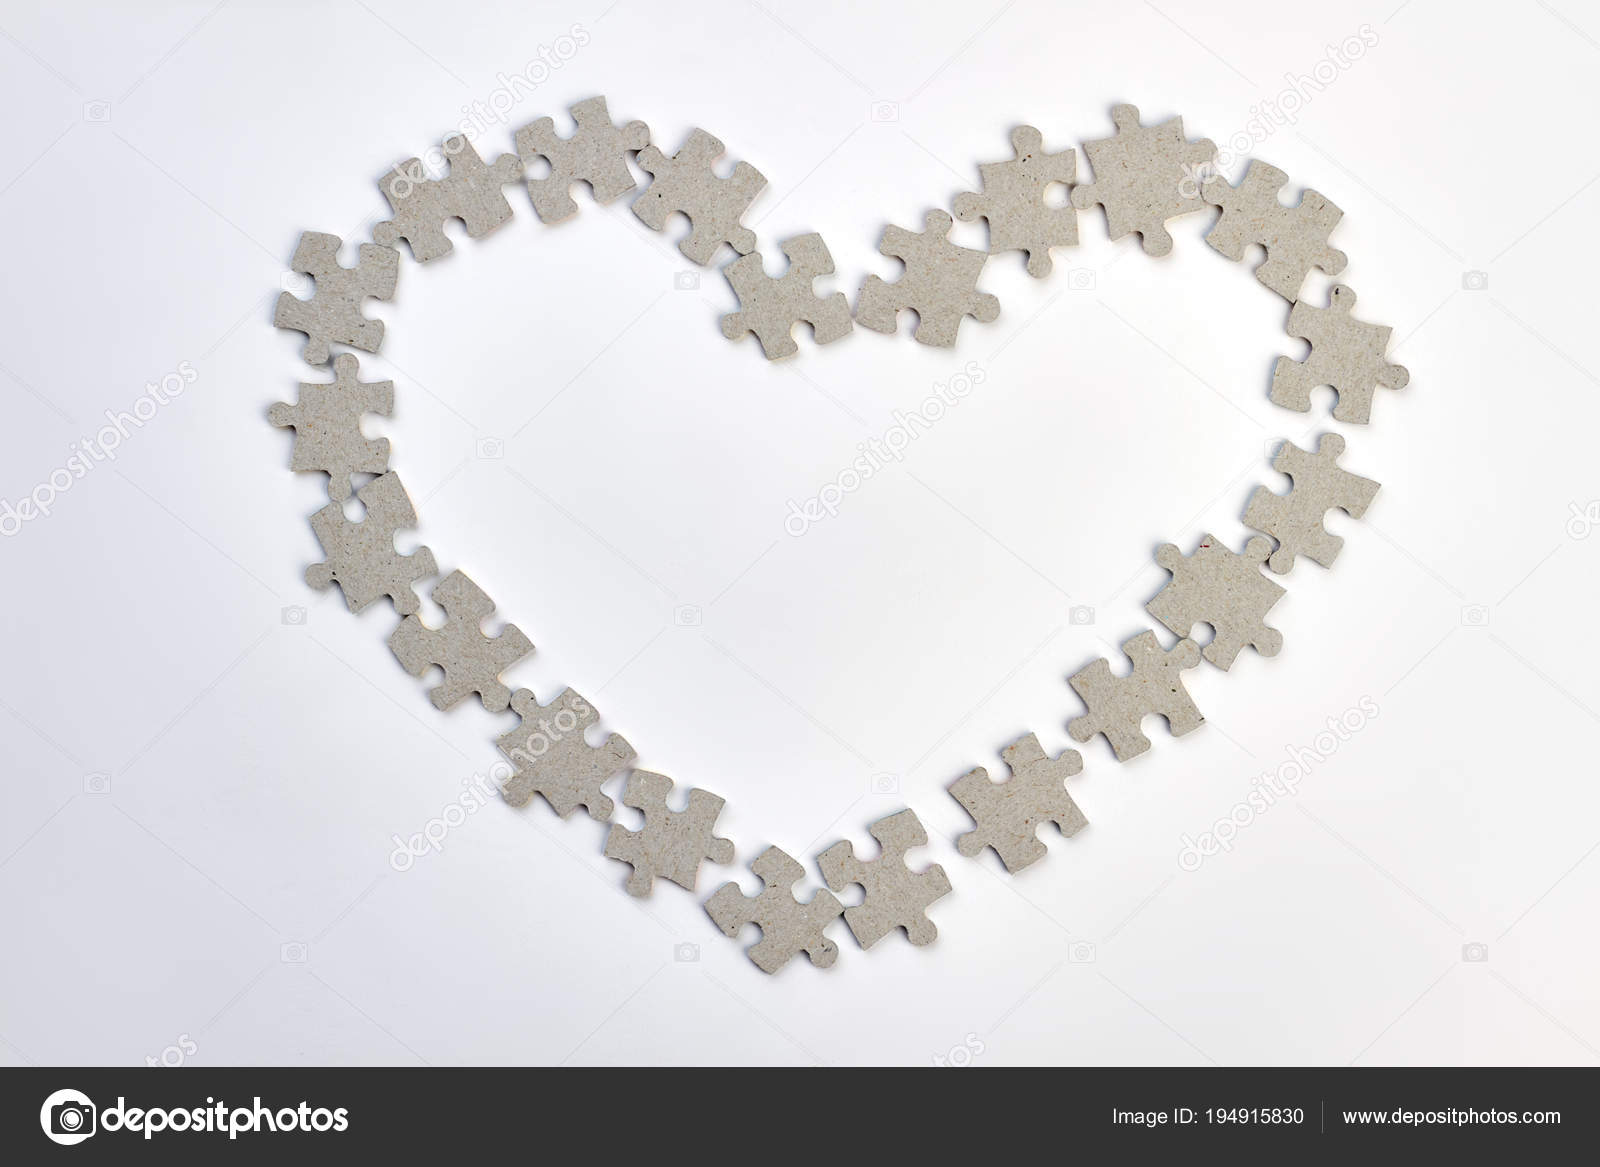 Herz-Rahmen aus Rätsel — Stockfoto © Denisfilm #194915830